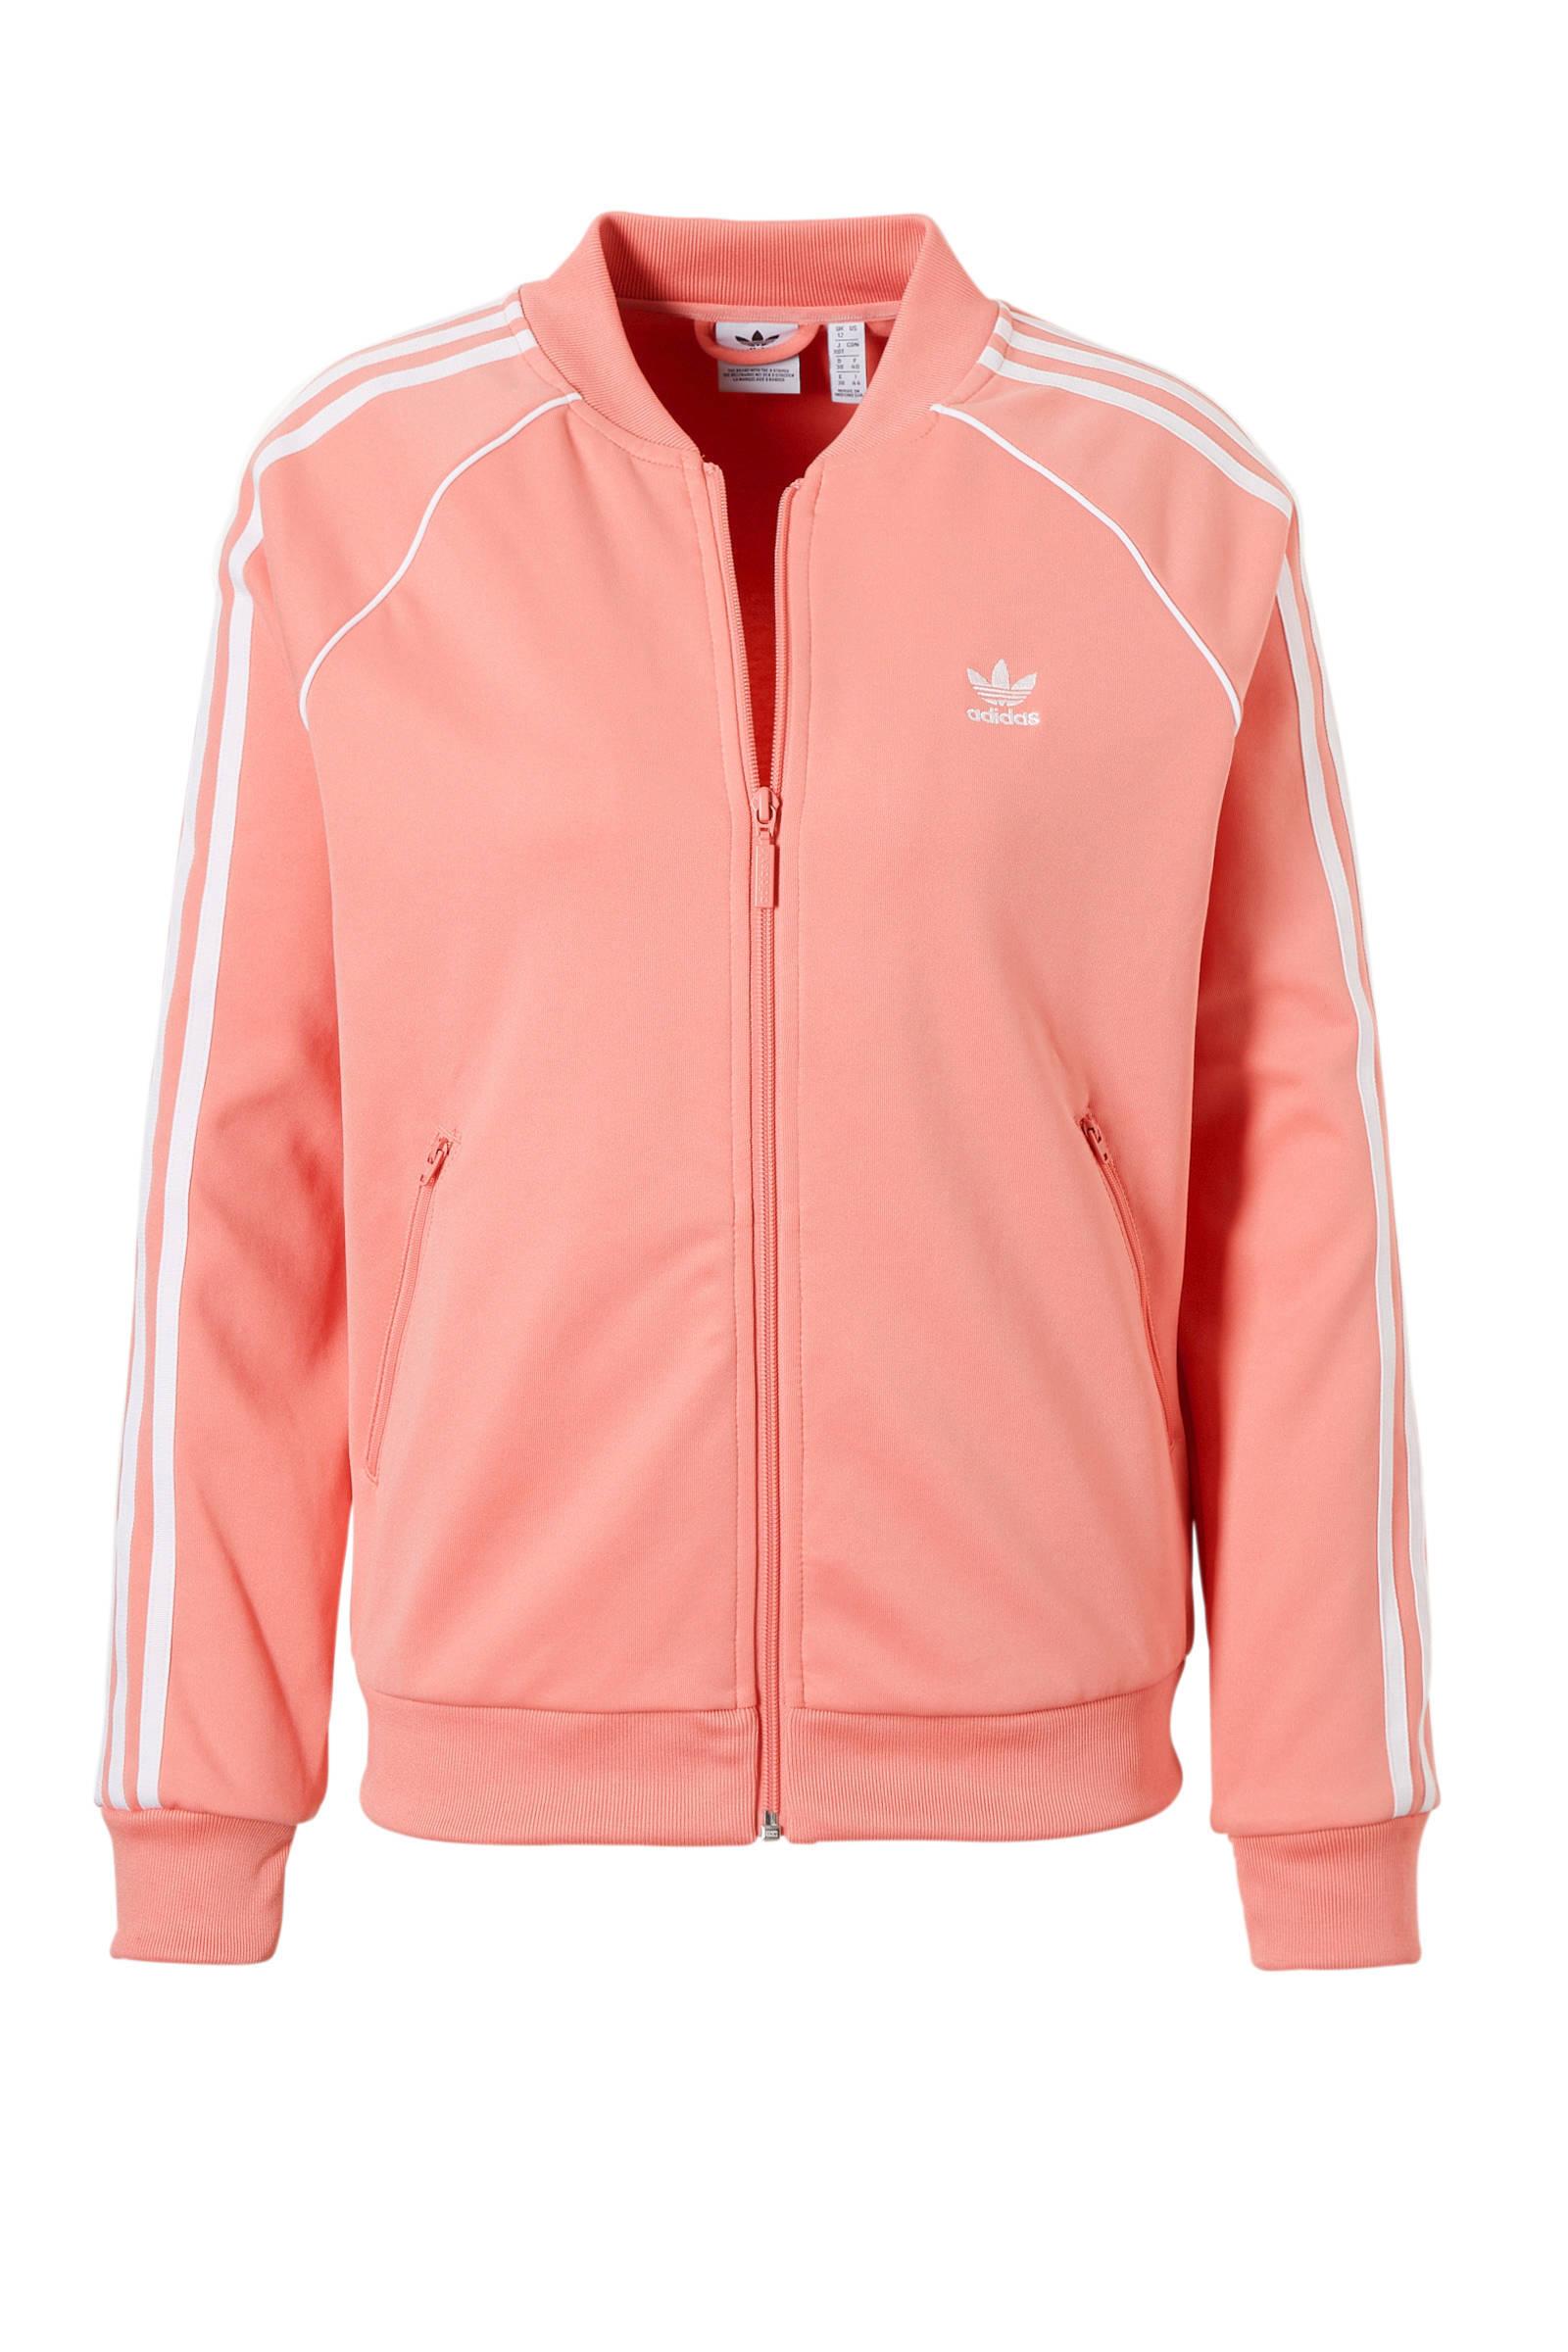 adidas Originals vest roze | wehkamp